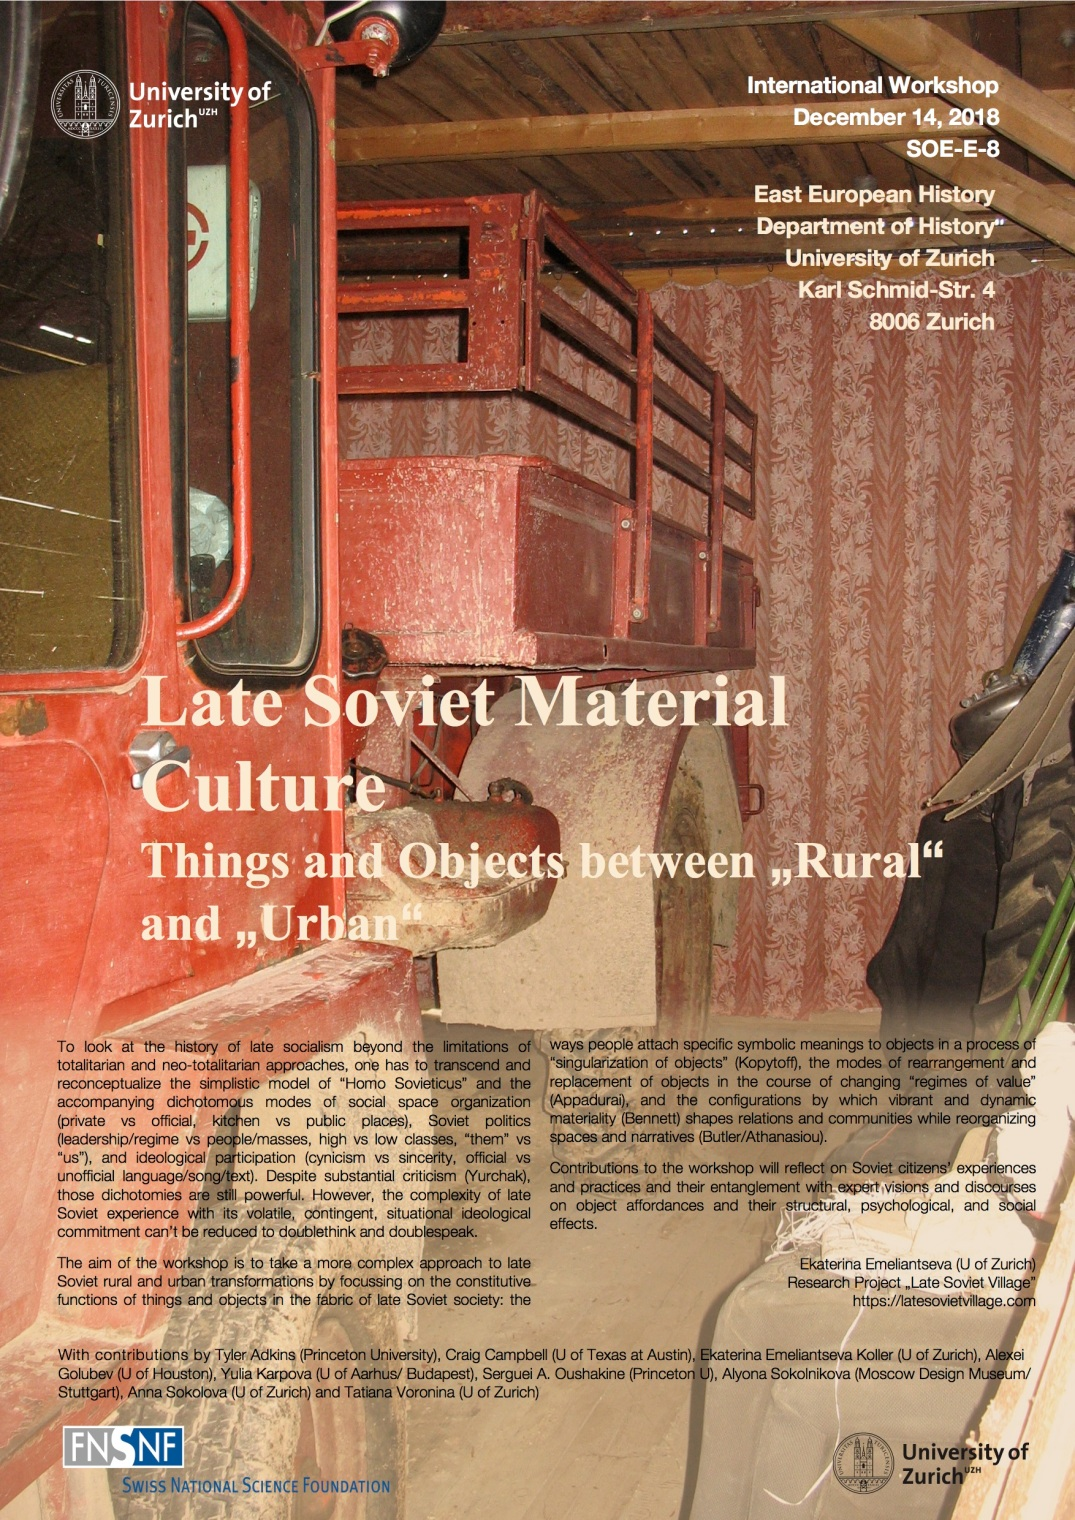 material_culture_poster